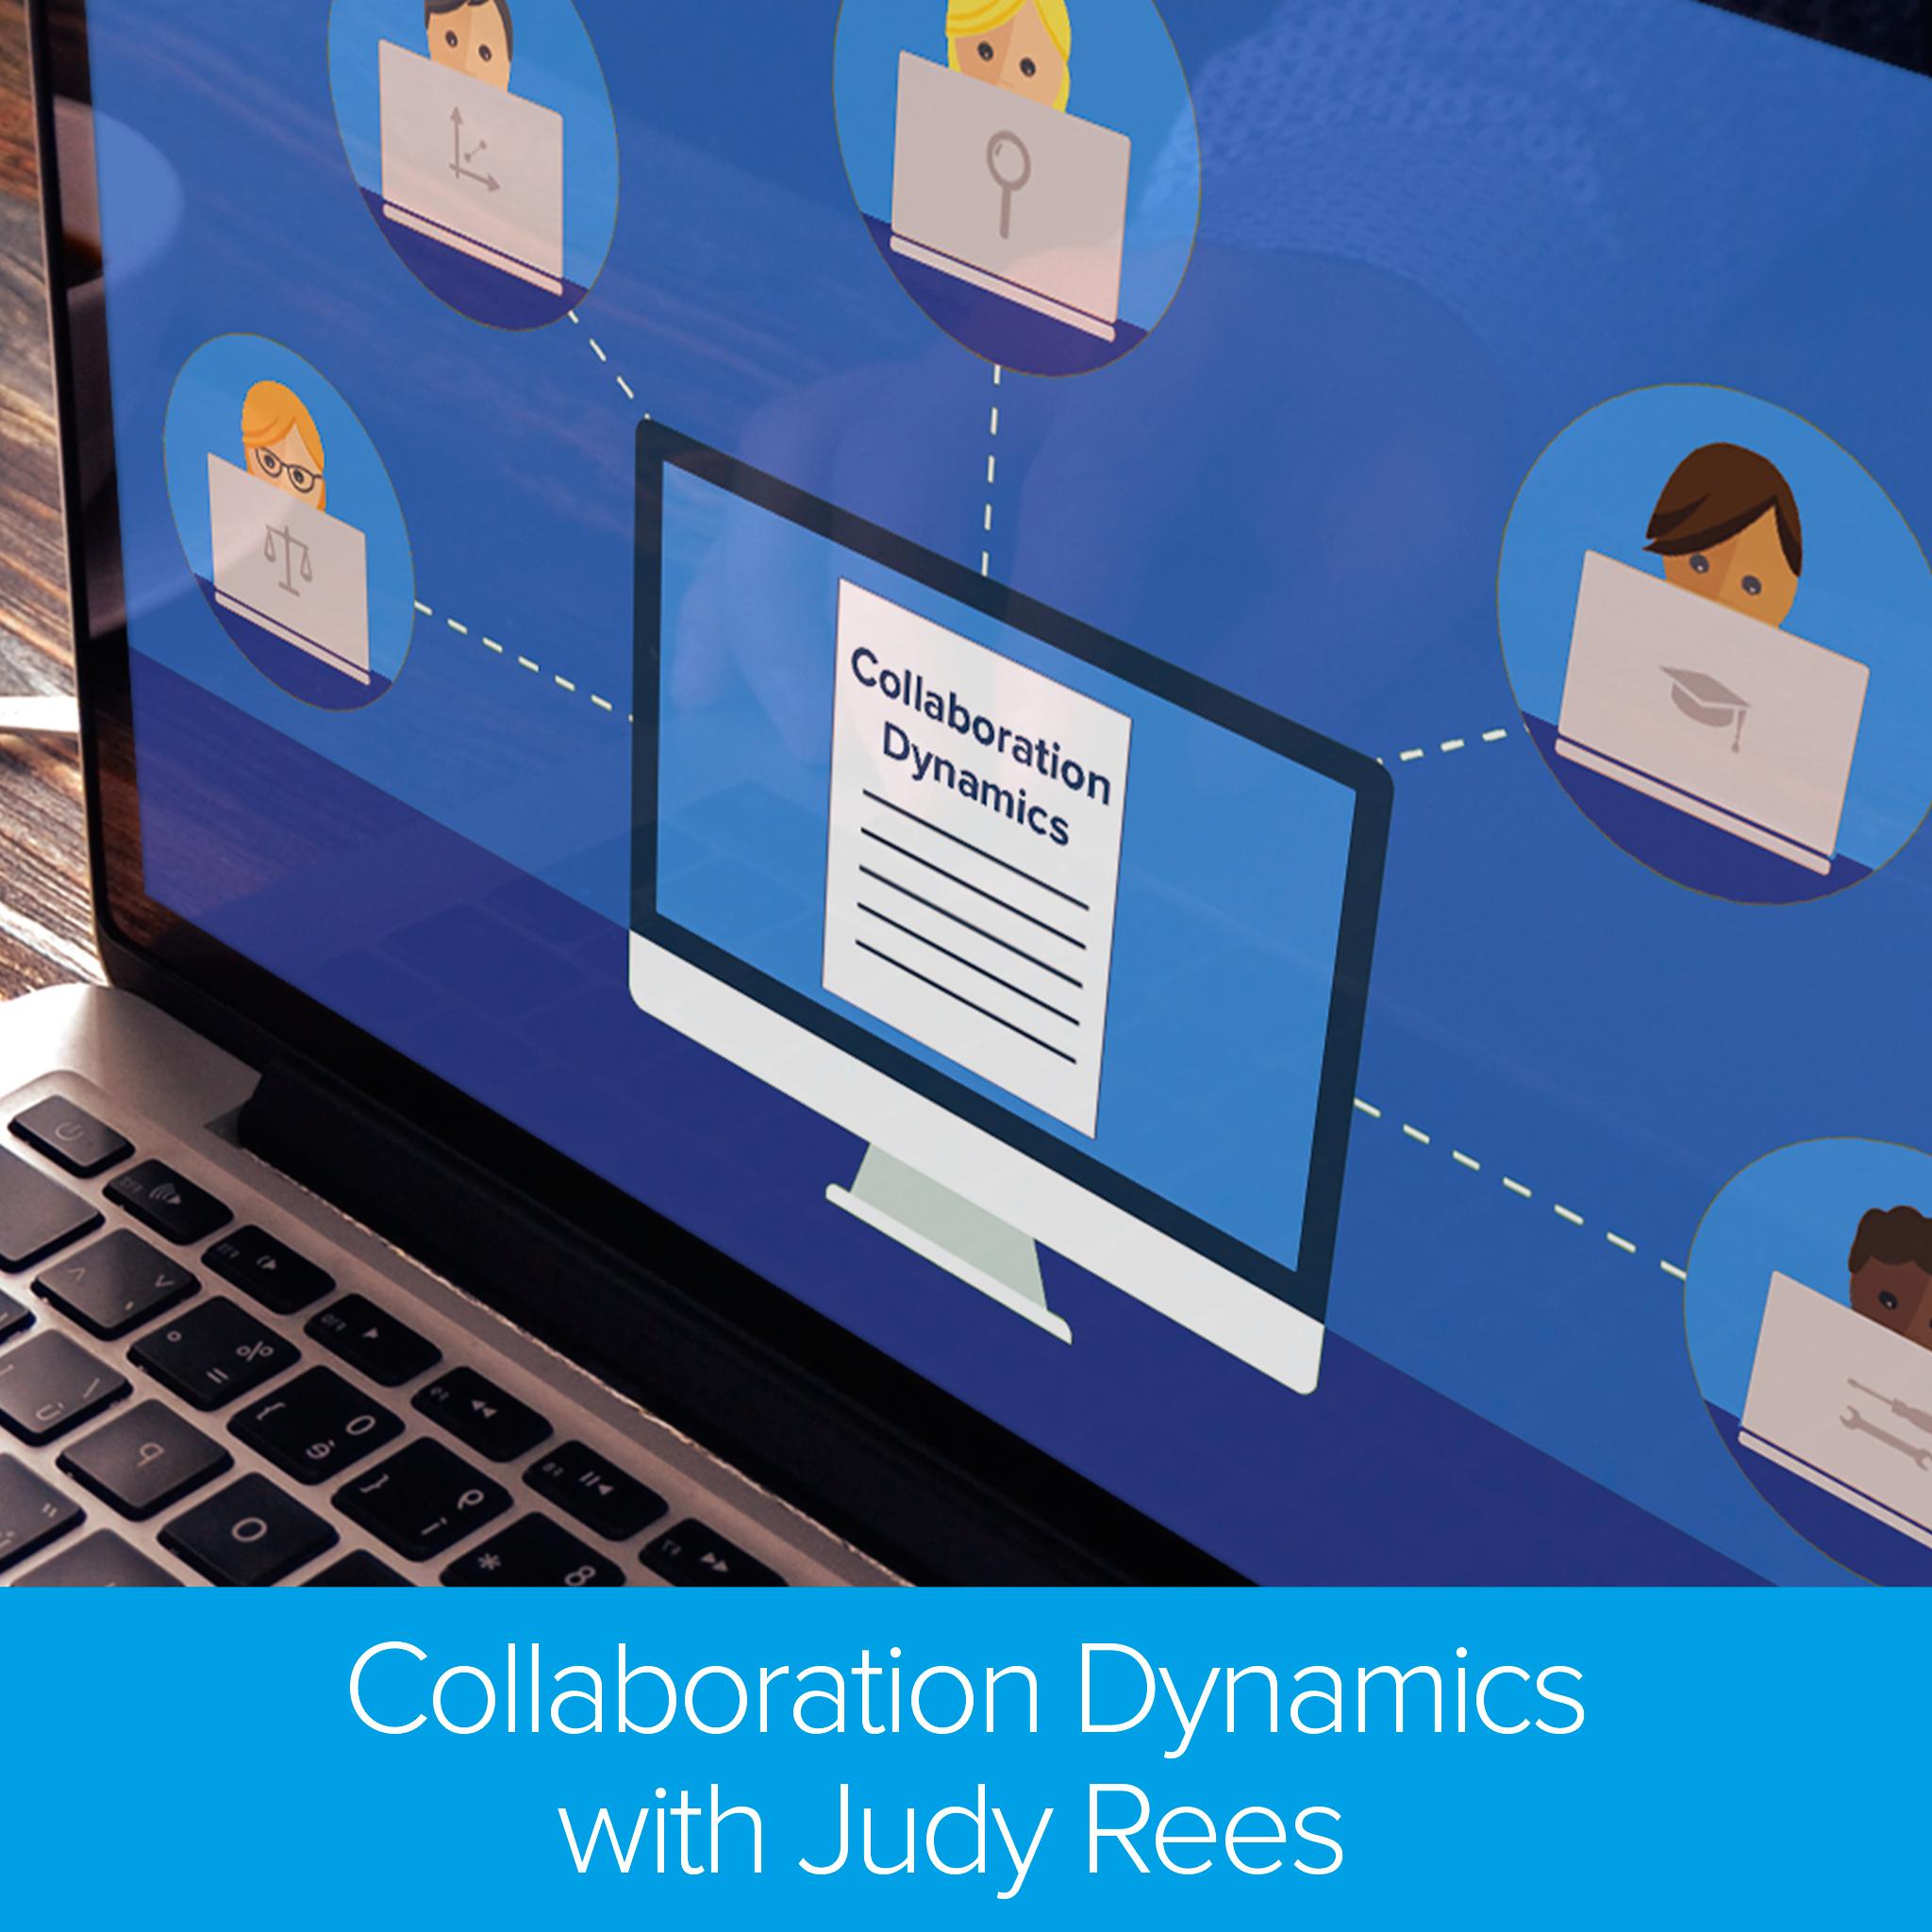 Collaboration Dynamics